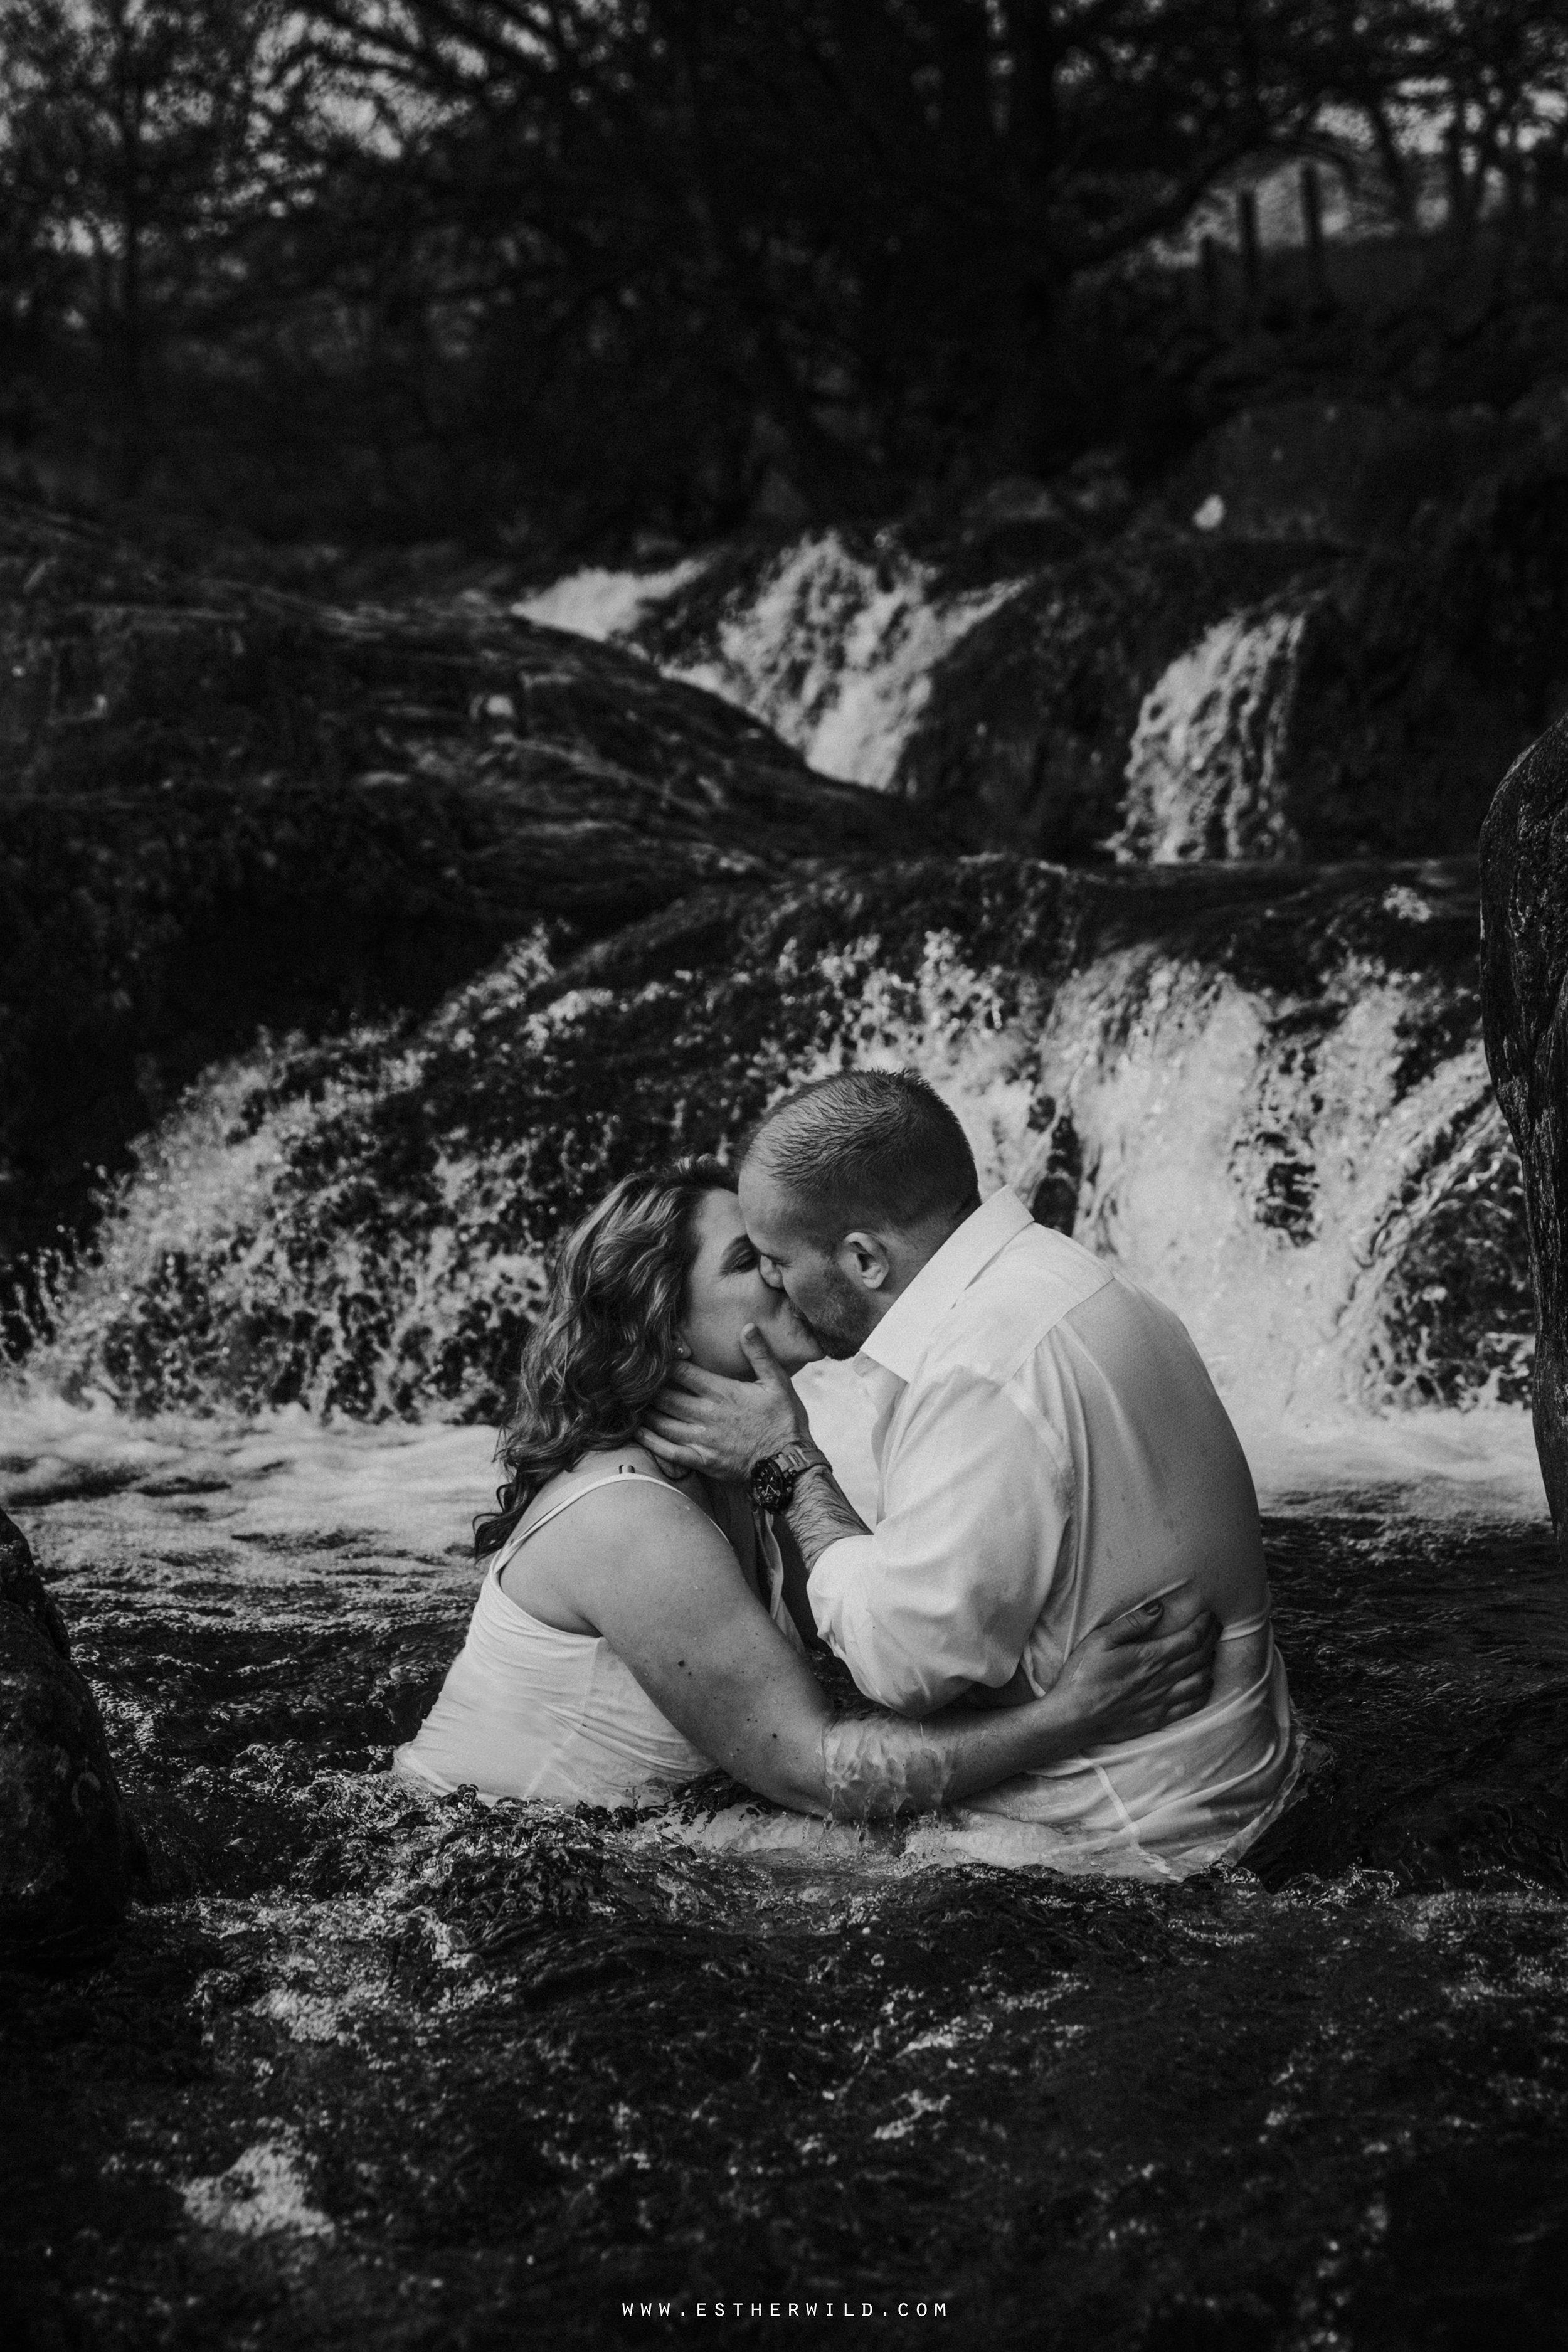 Cumbria_Lake_District_Wasdale_Wedding_Photographer_Destination_Engagement_Anniversary_Esther_Wild_IMG_4386.jpg